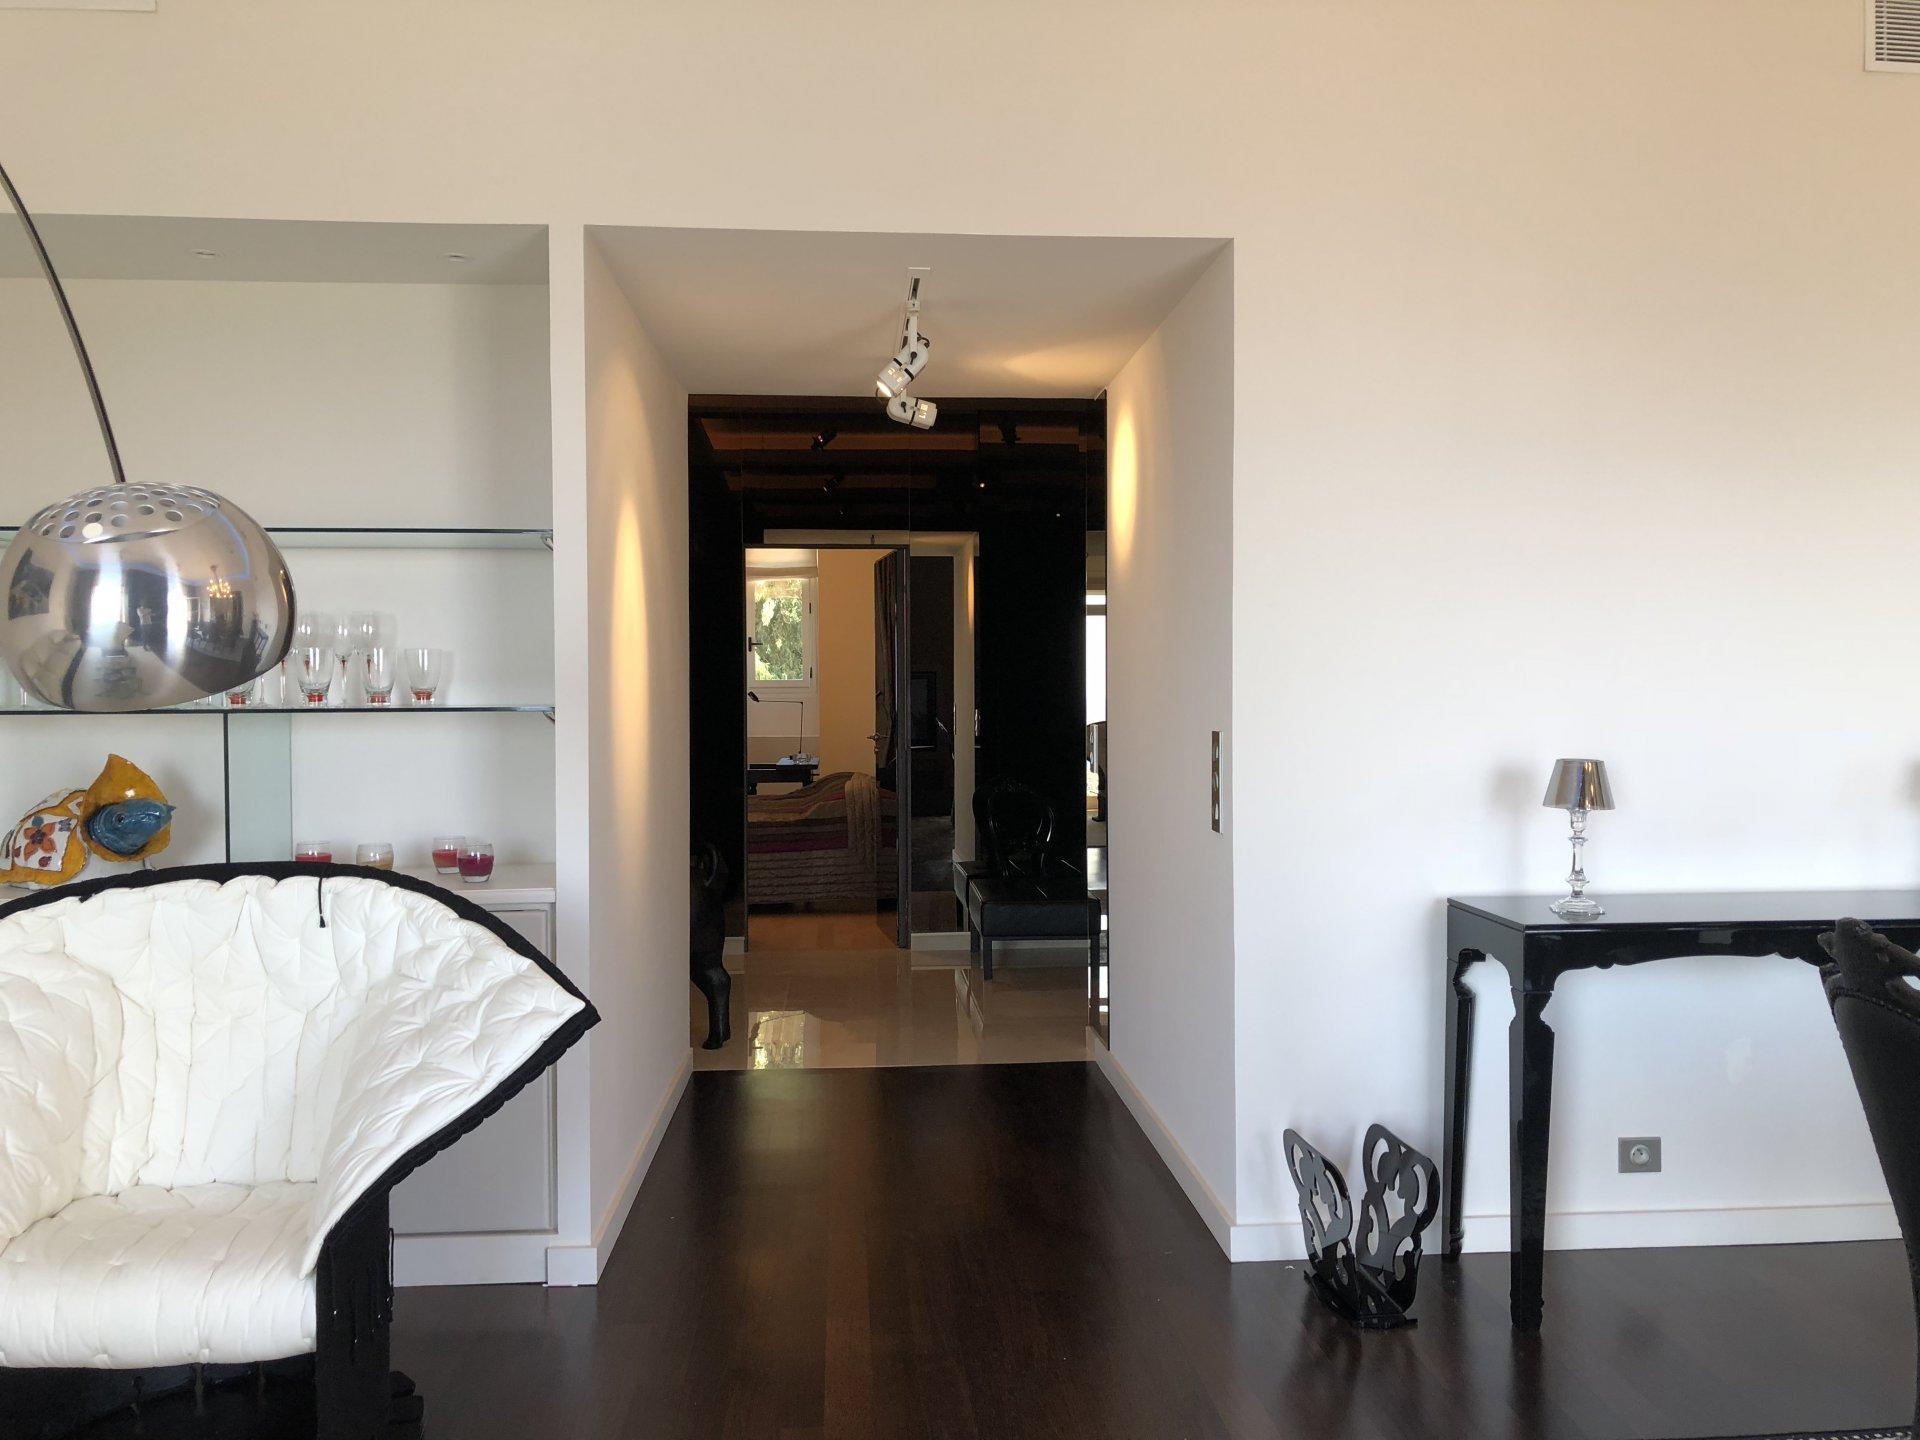 CANNES - La Californie - Grand appartement grand standing